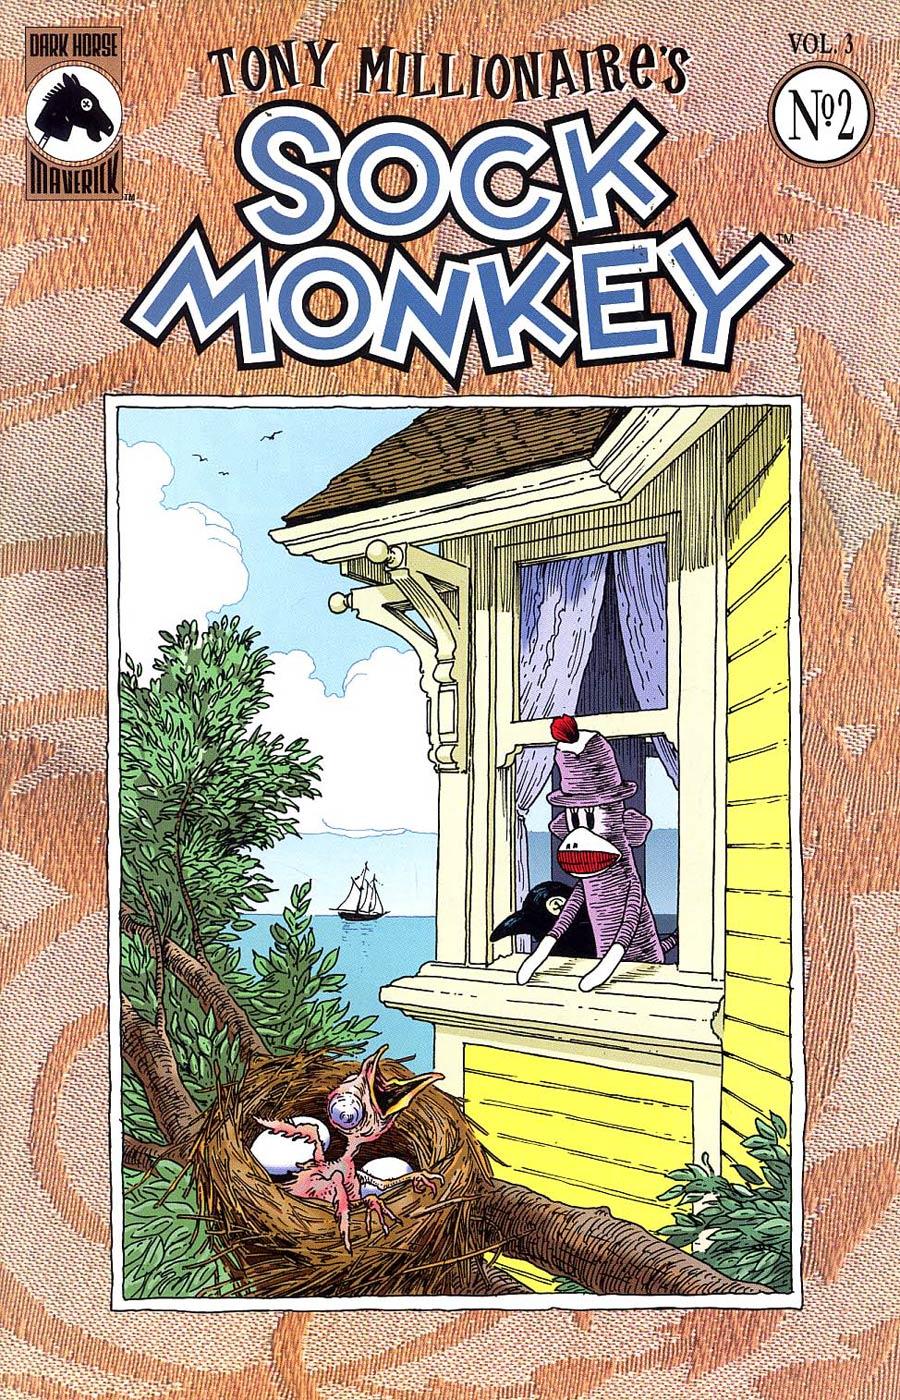 Sock Monkey Vol 3 #2